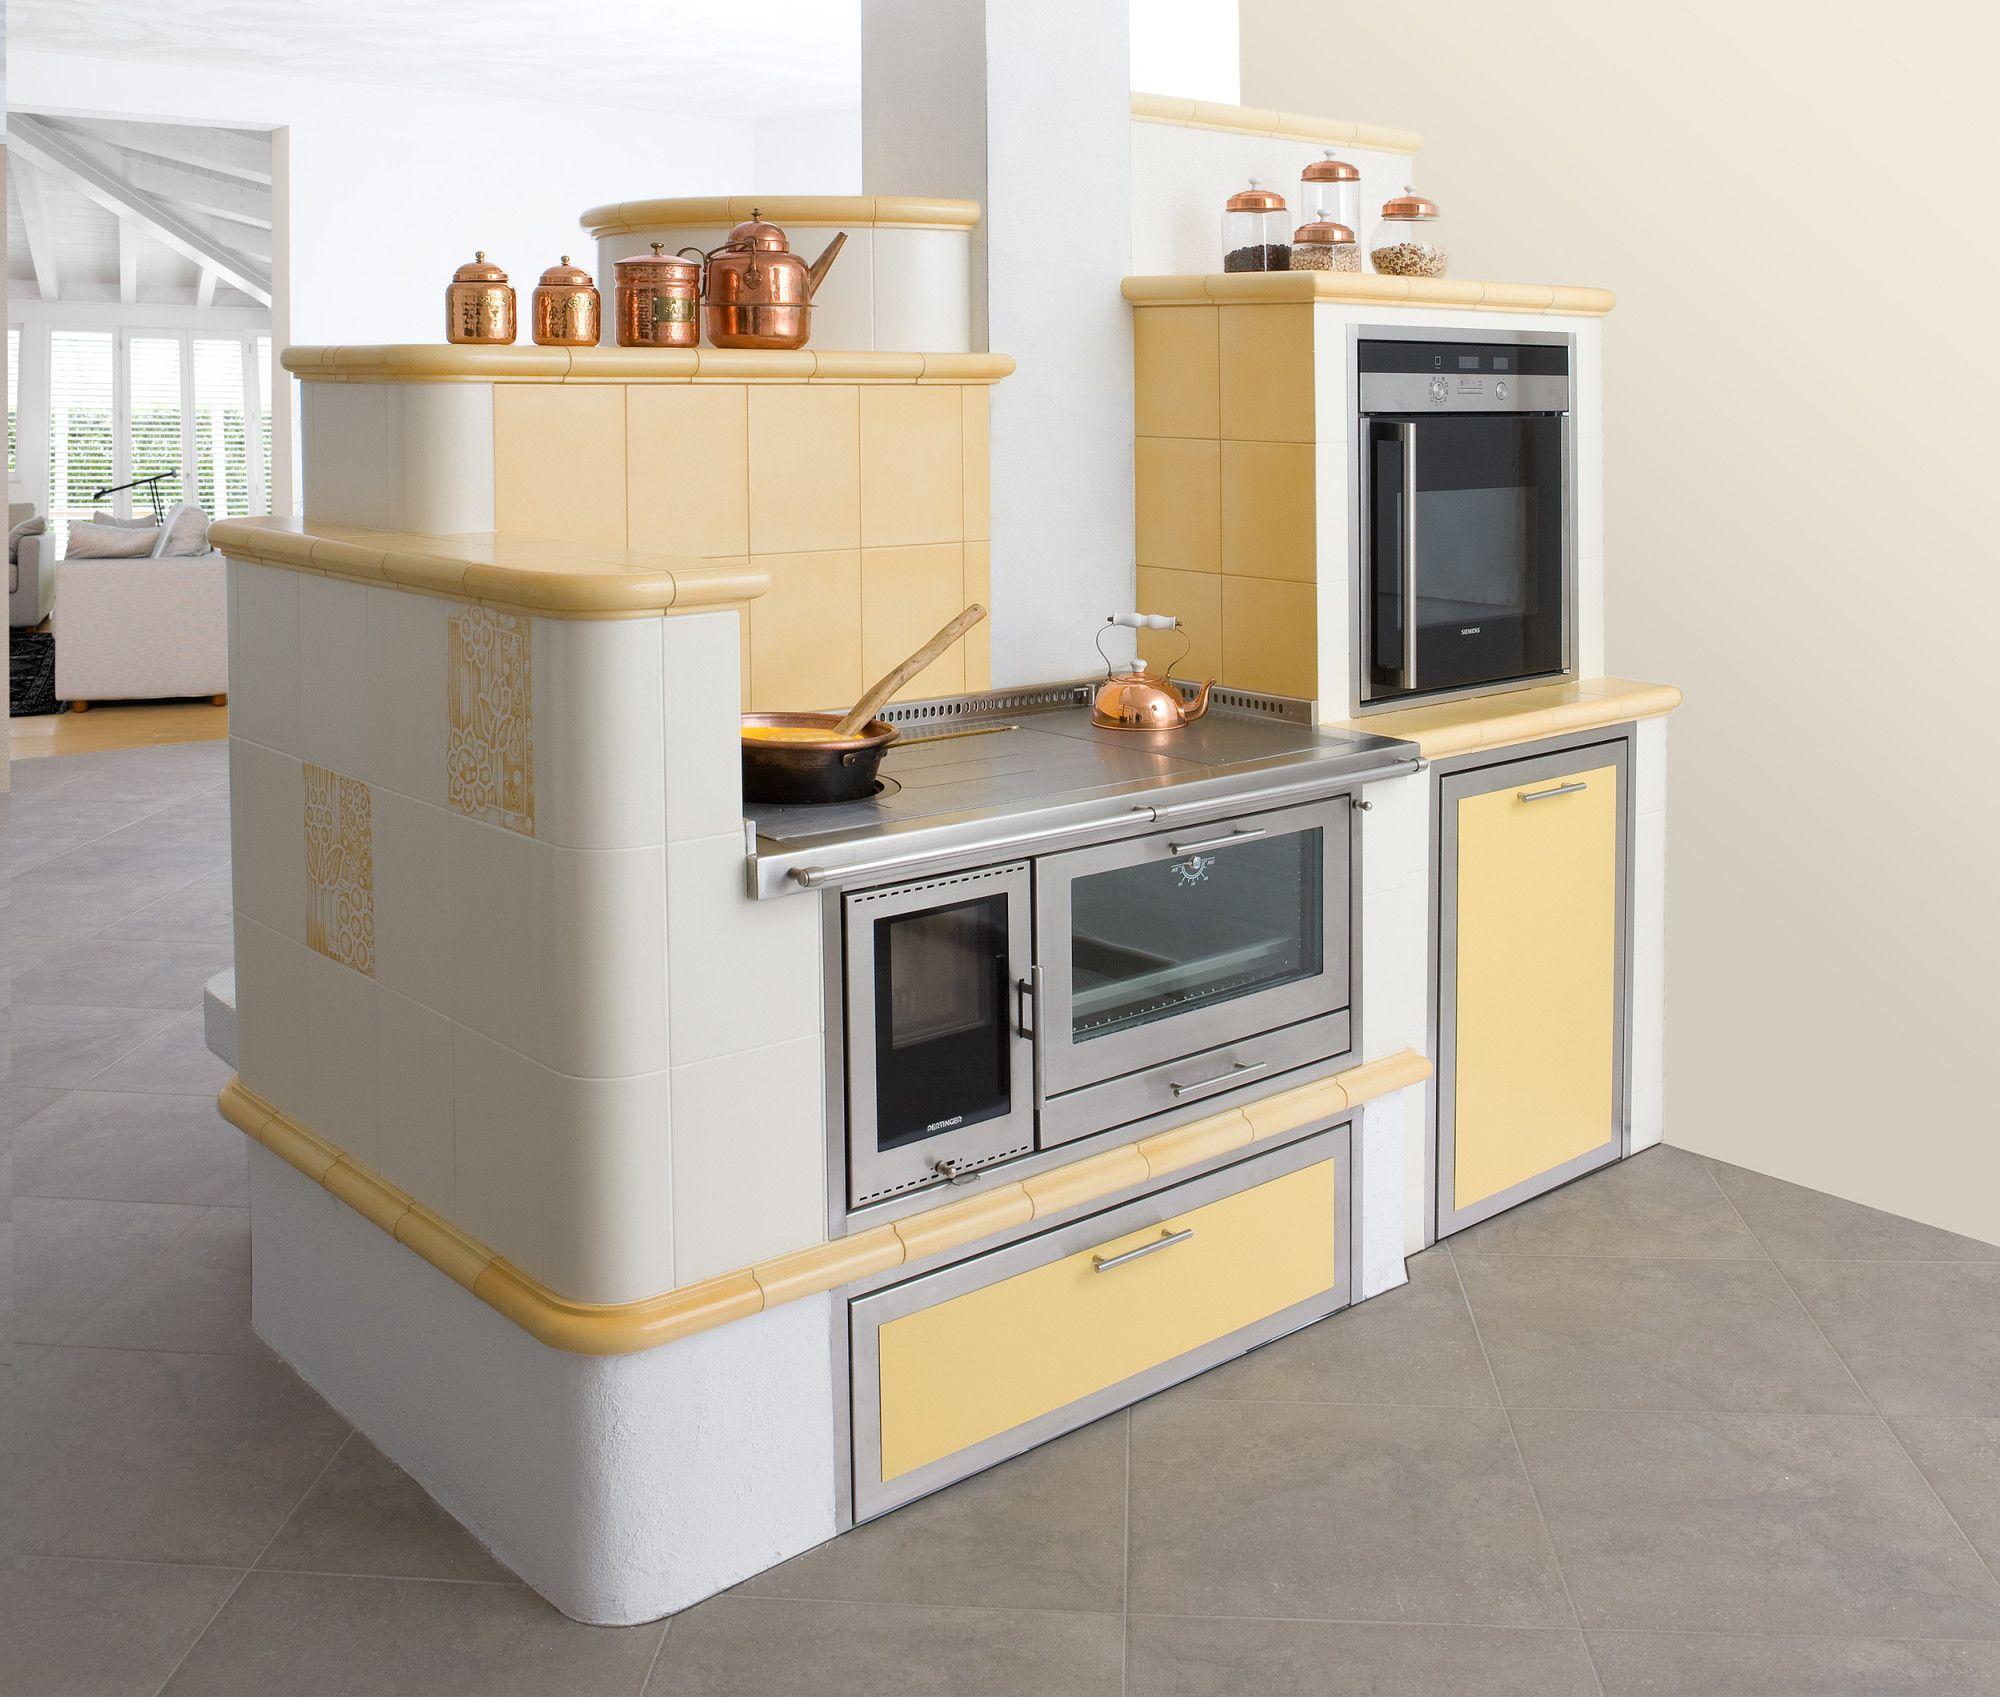 Holzofen In Moderner Kuche Holzofen Fur Kuche Zum Kochen